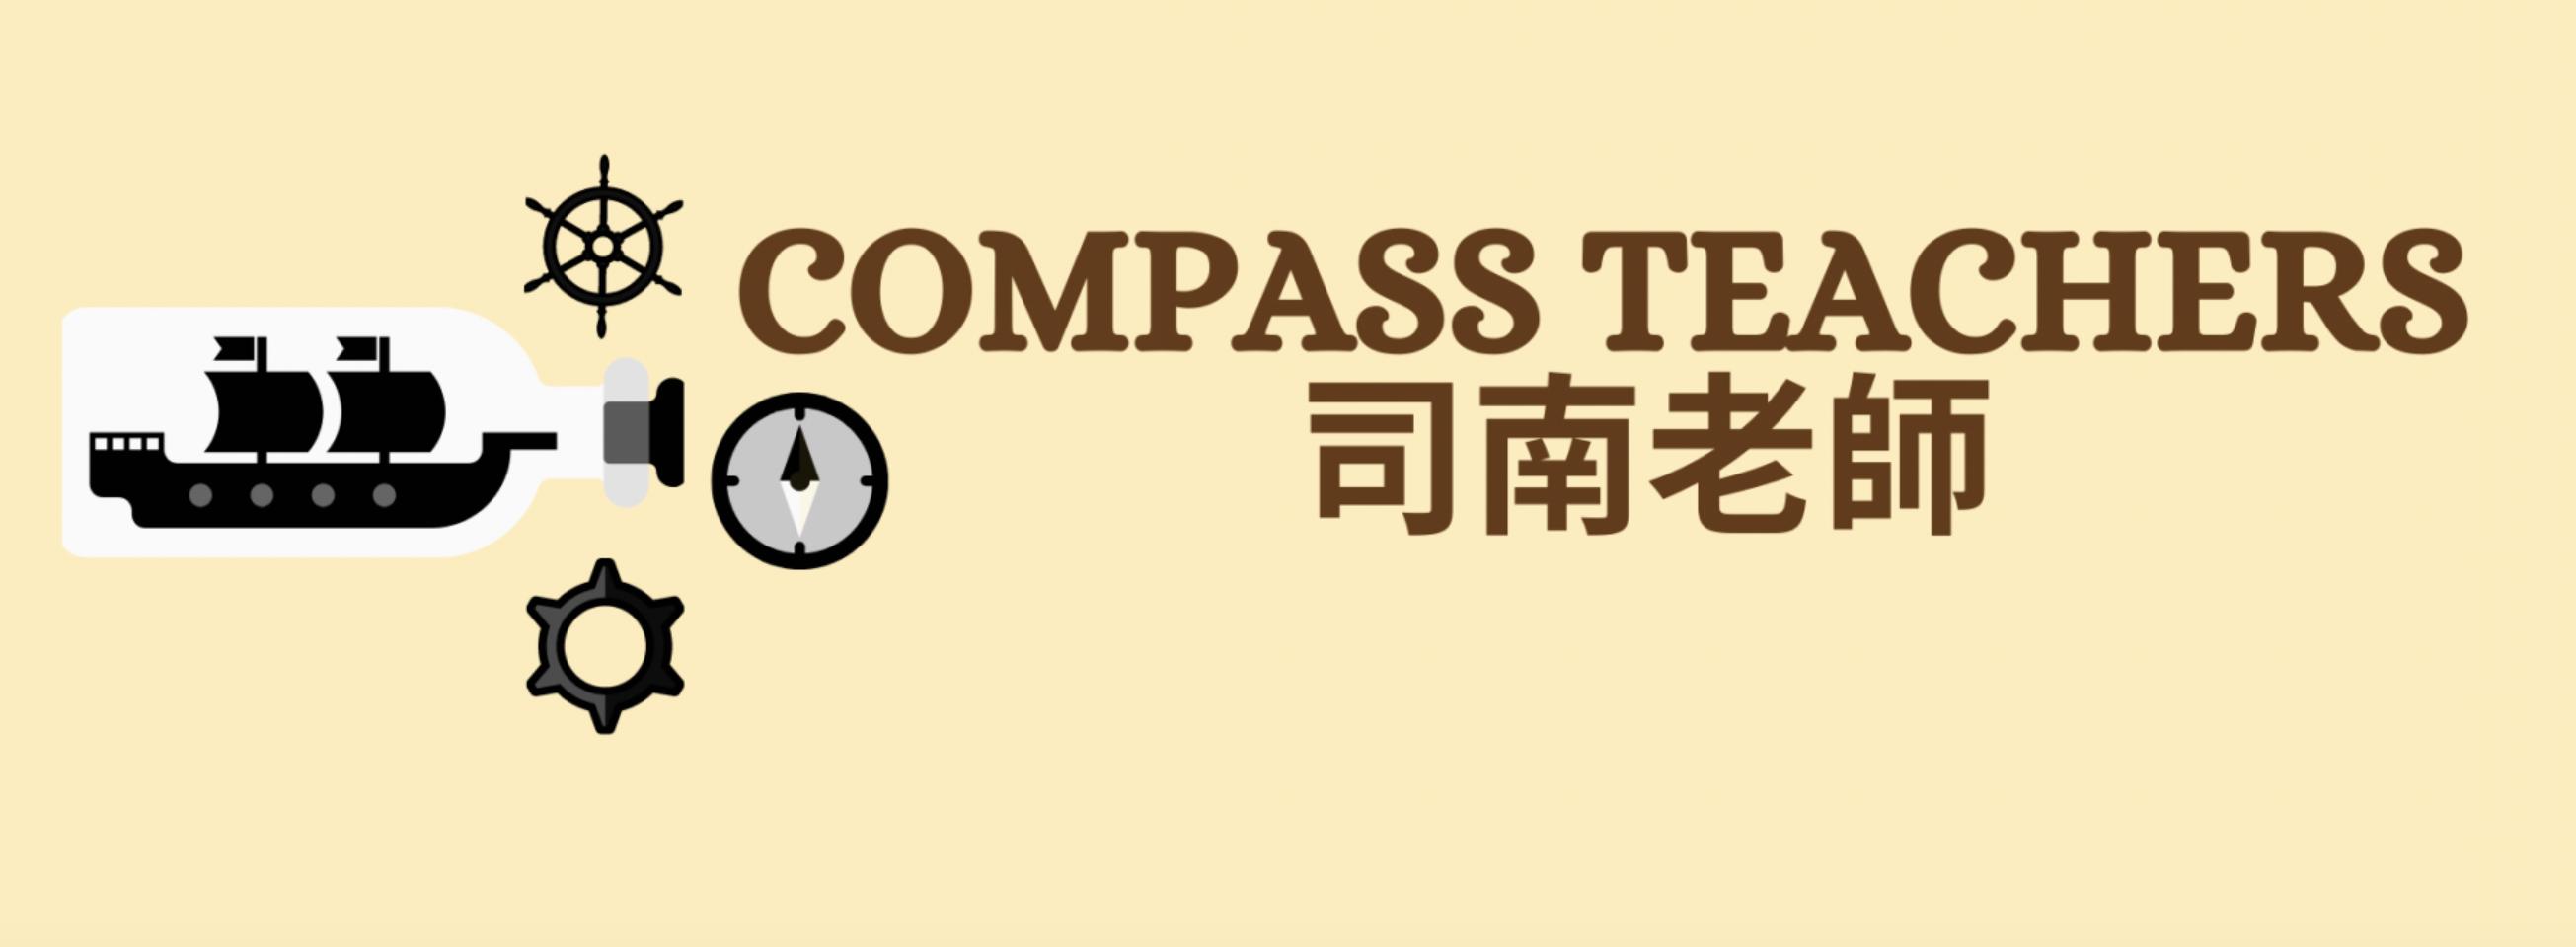 Compass Teachers Podcast